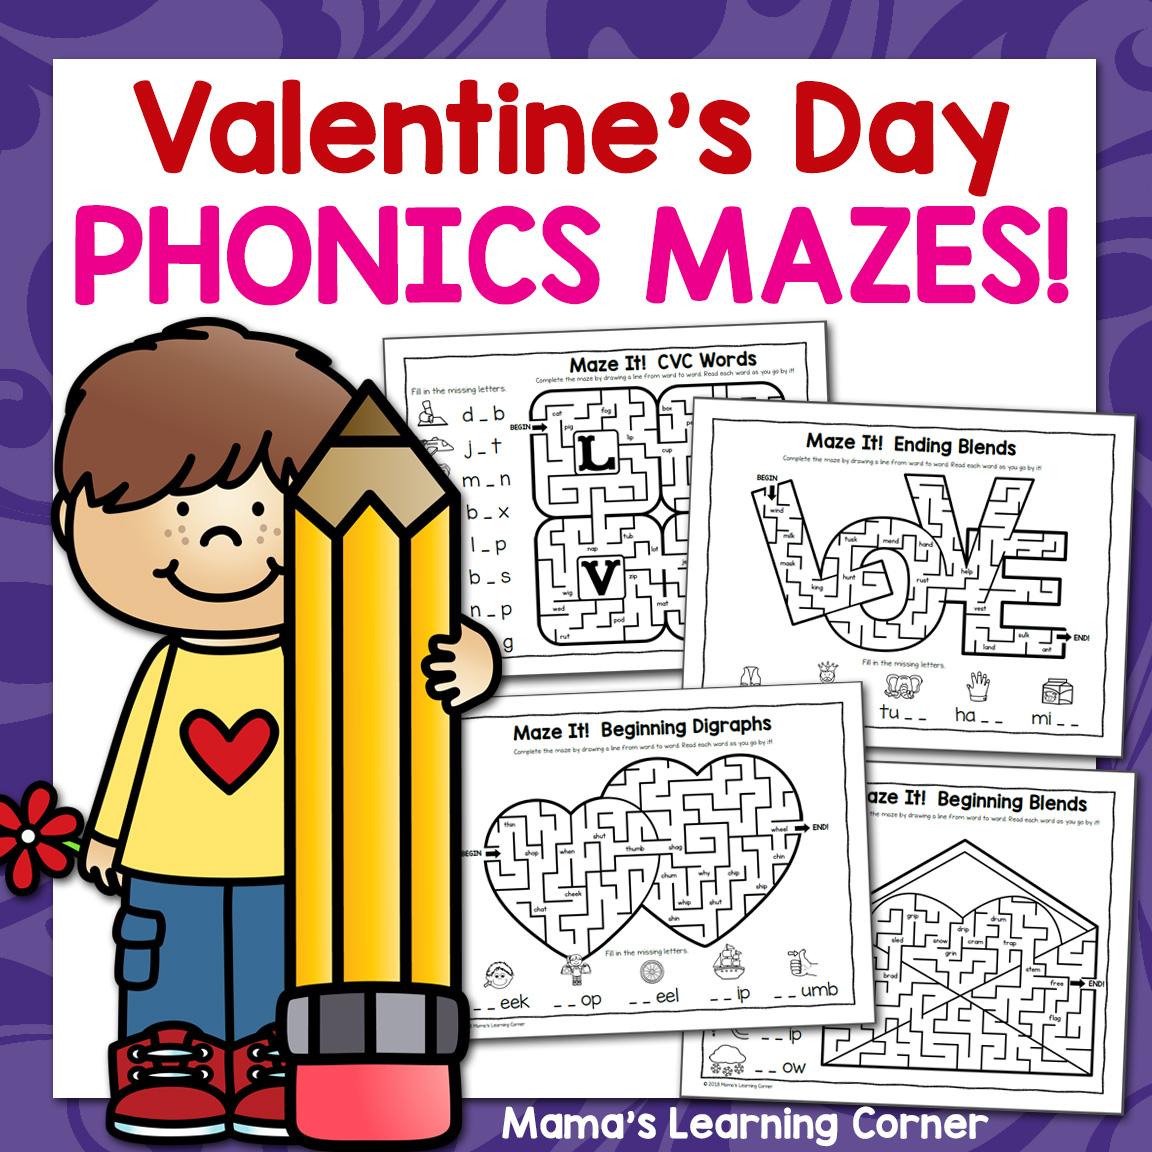 Phonics Mazes For Valentine S Day